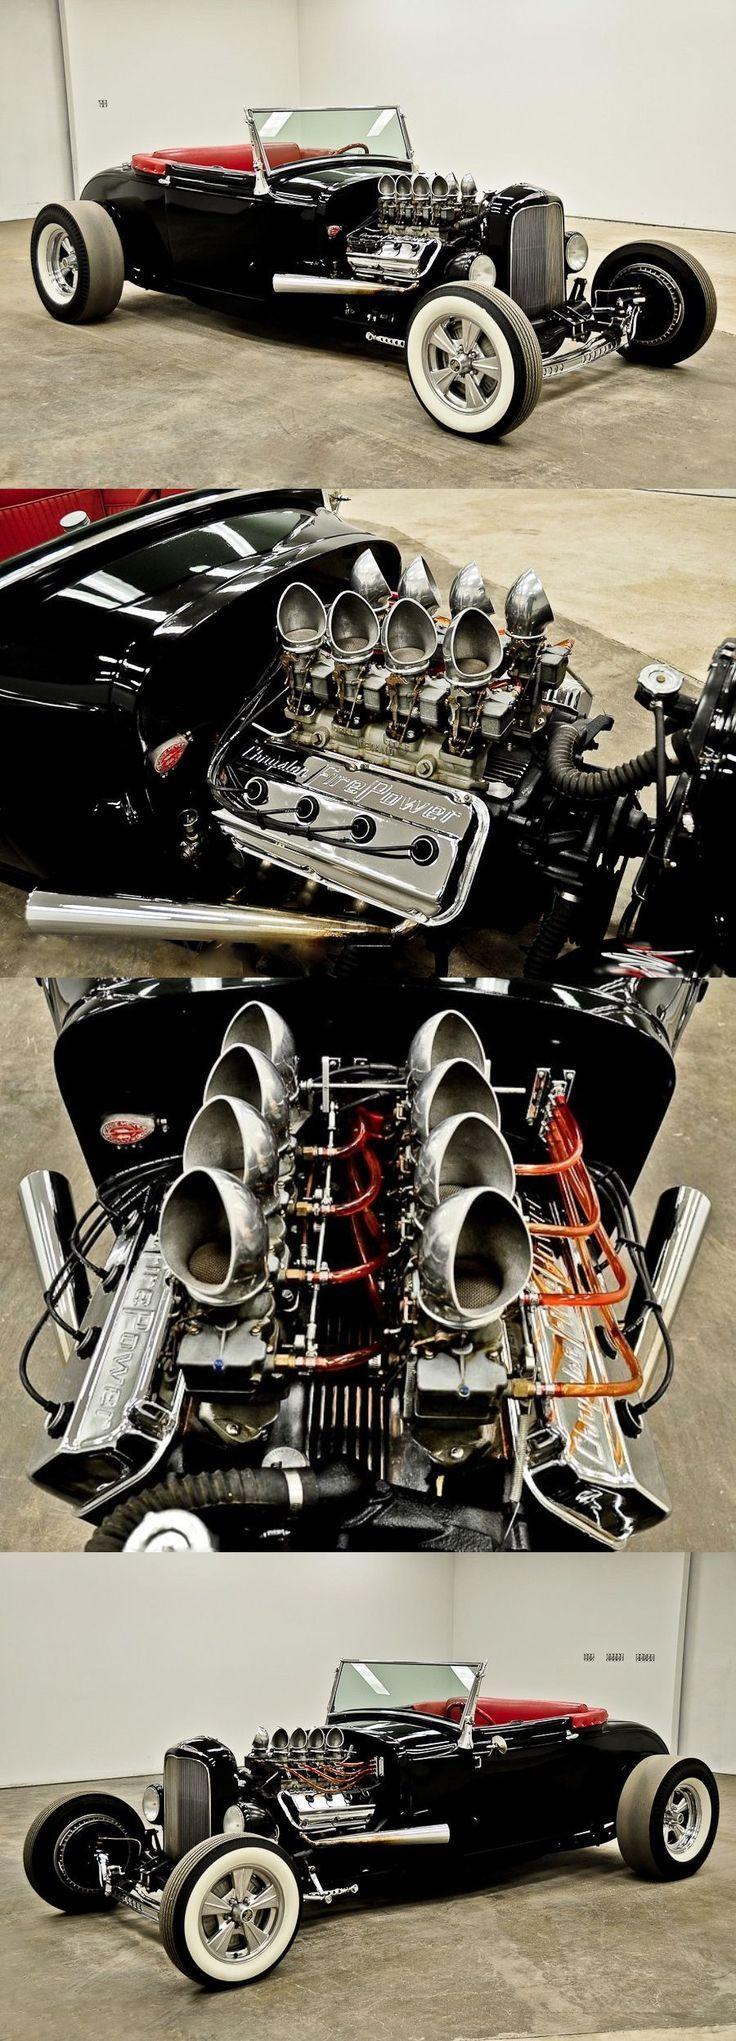 You will ❤ MACHINE Shop Café... (1932 Ford Old Skool Hot Rod) #hotrodclassiccars